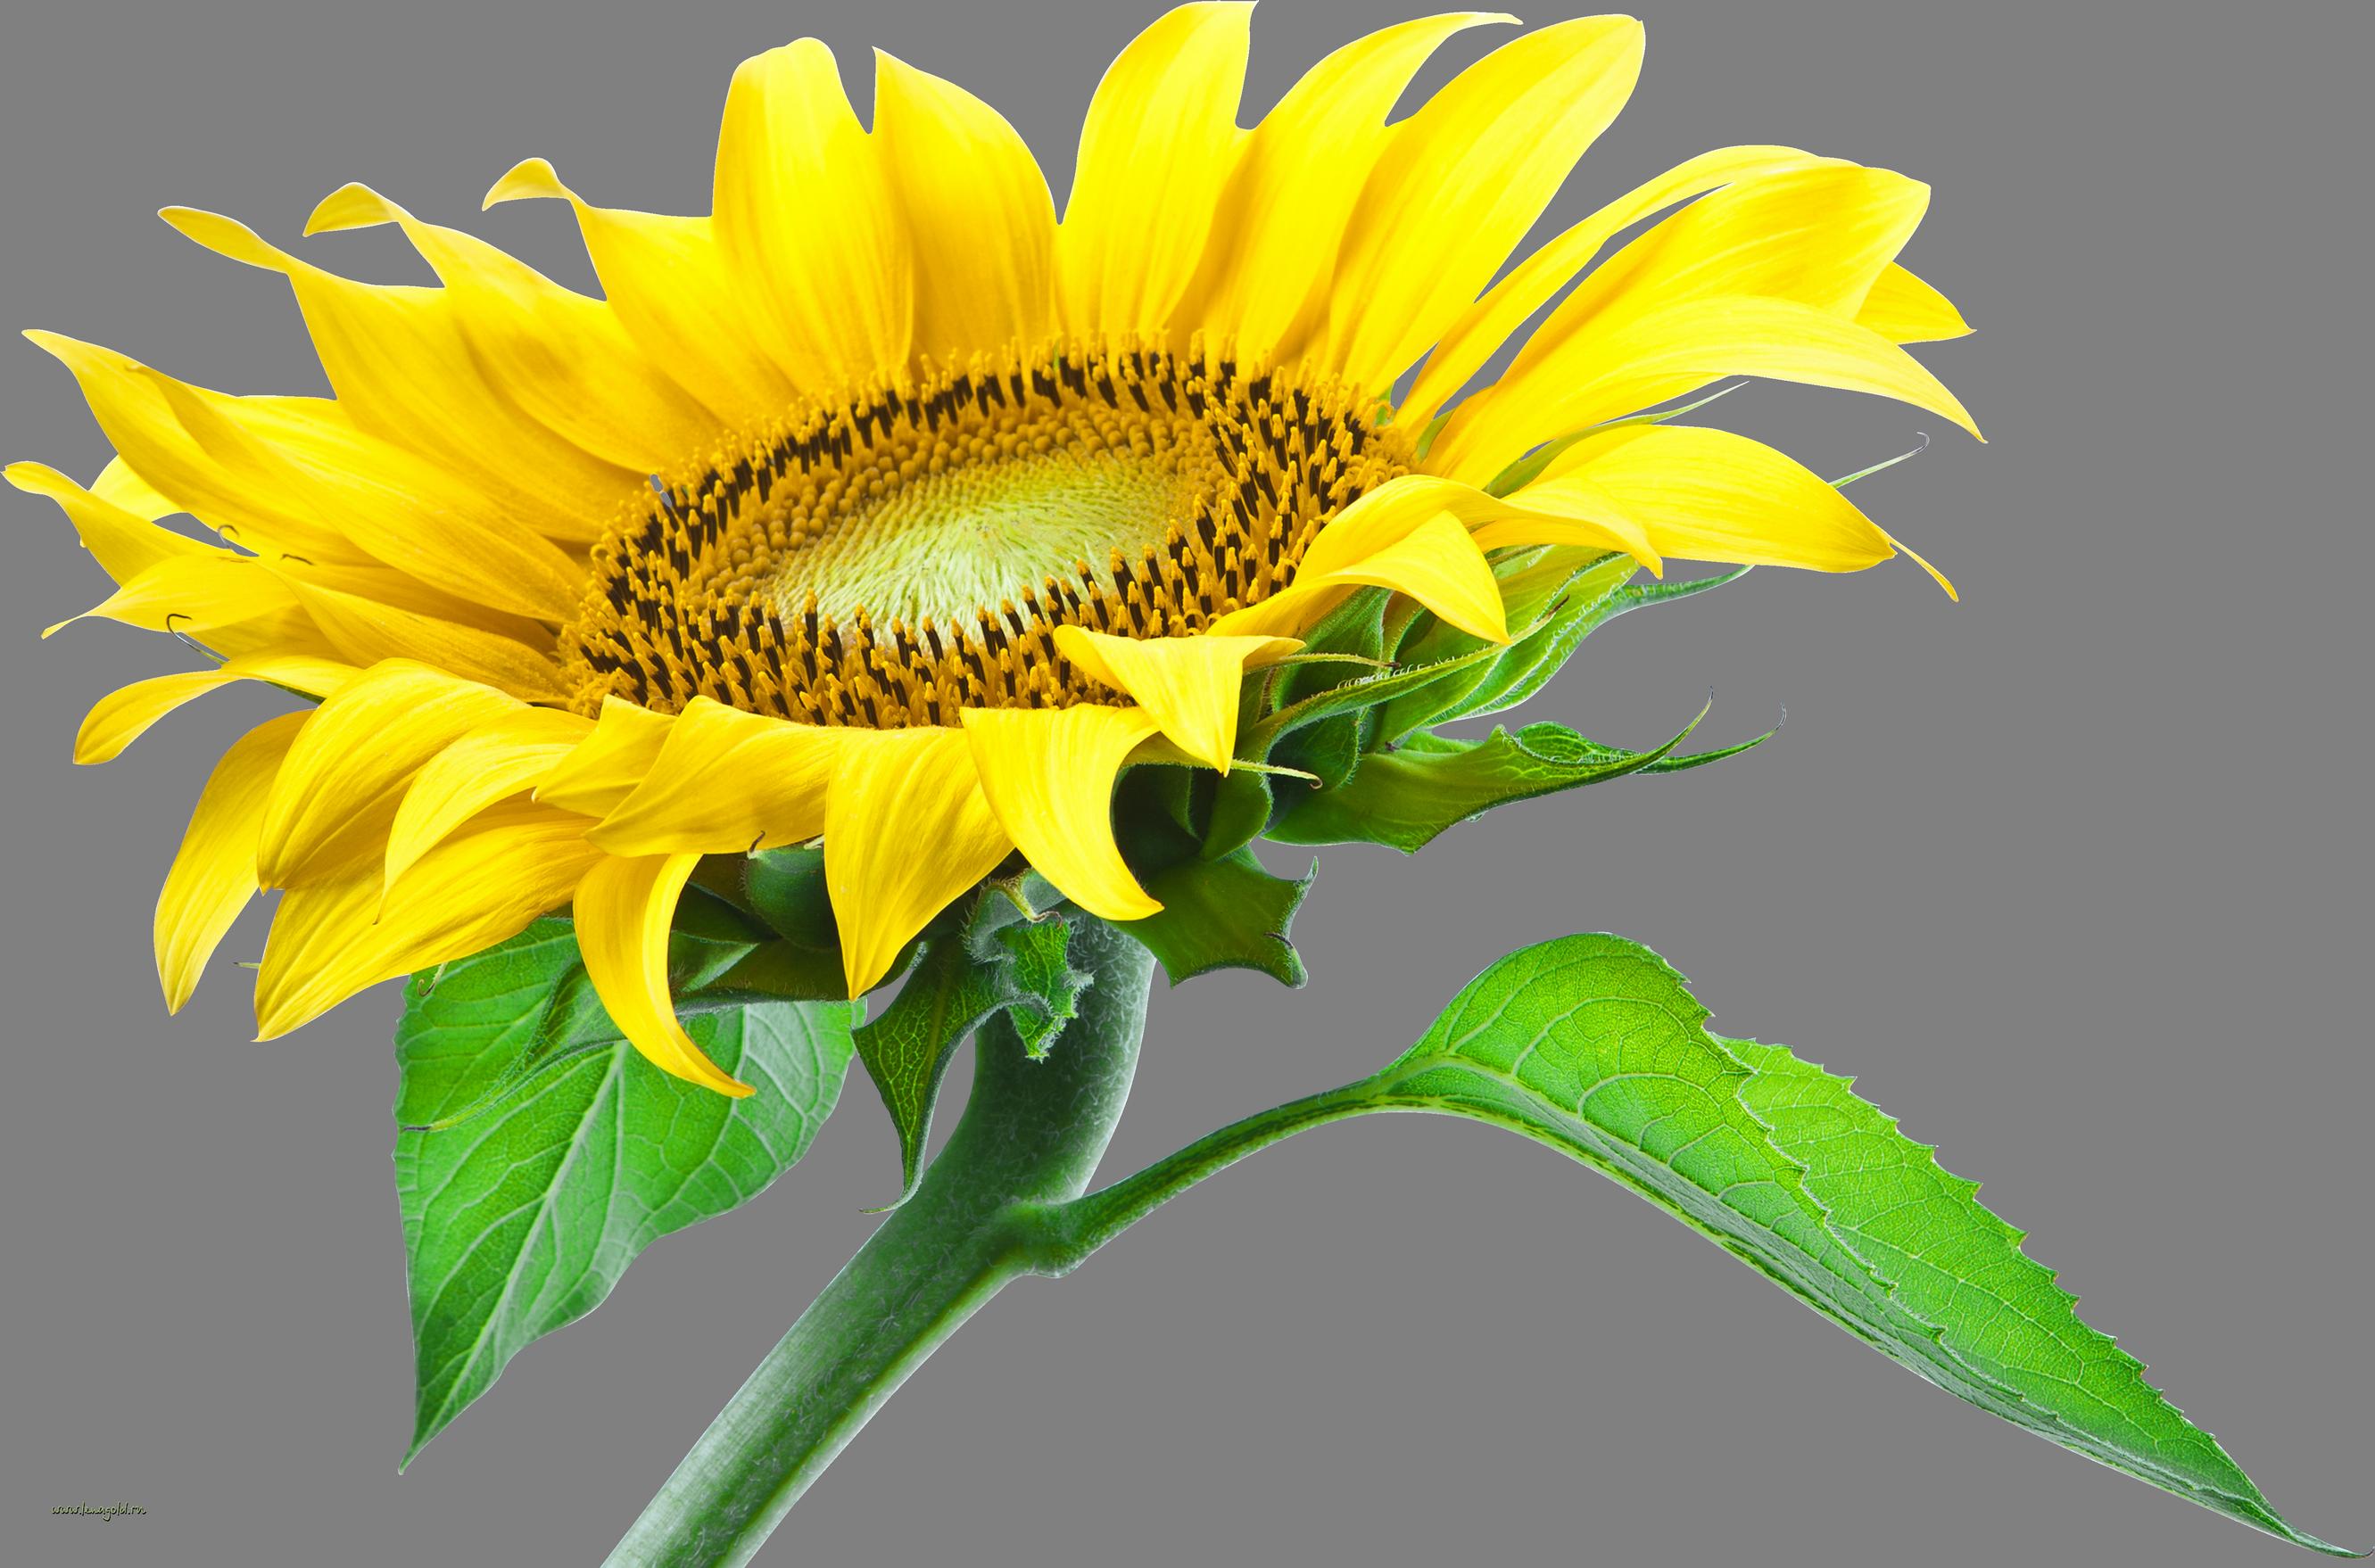 Big Explosion Png Png Image Purepng: Sunflower PNG Image - PurePNG